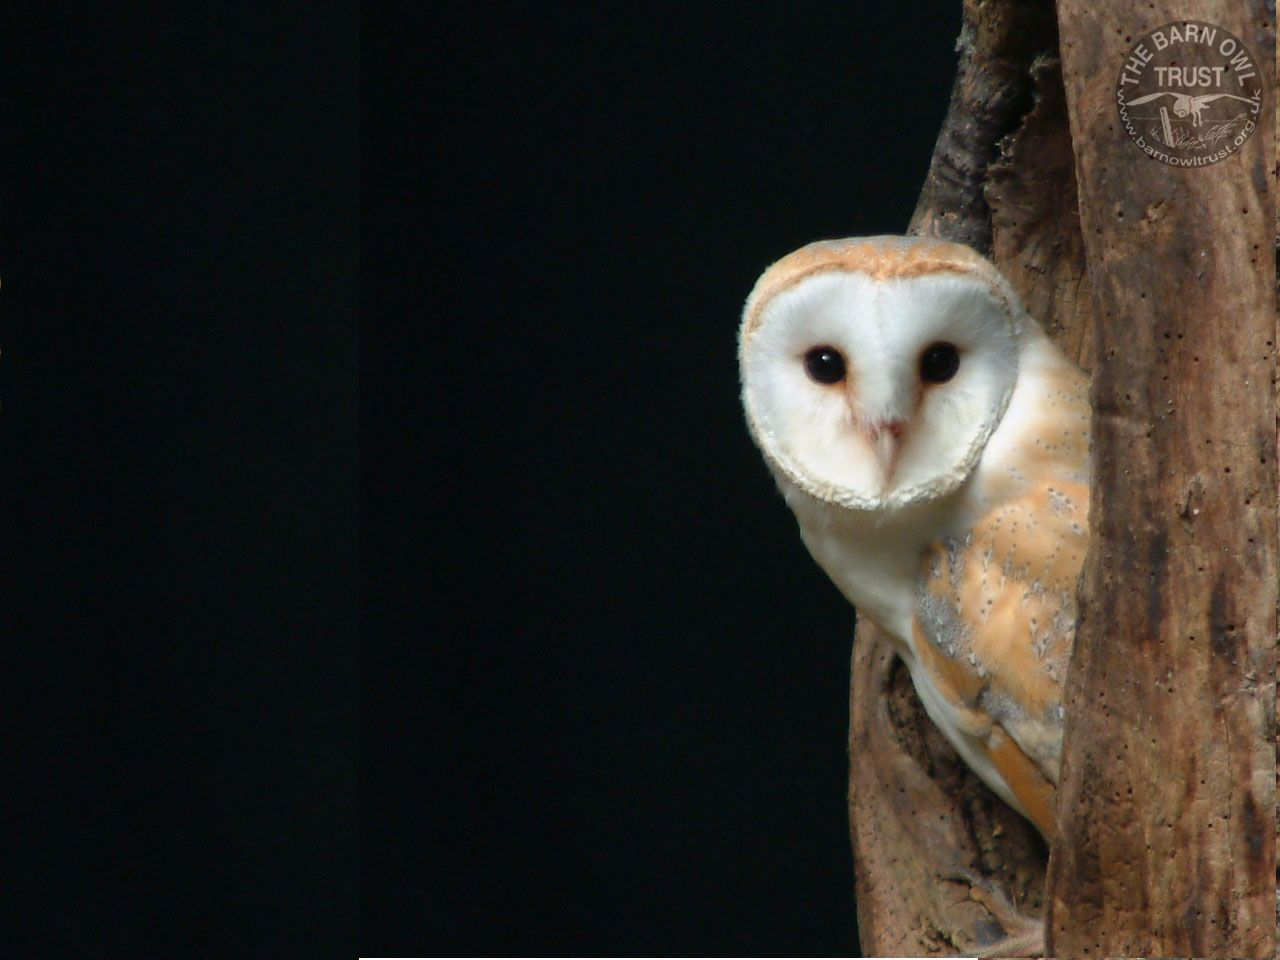 Barn Owl Hollow Tree Melanie Lindenthal The Barn Owl Trust